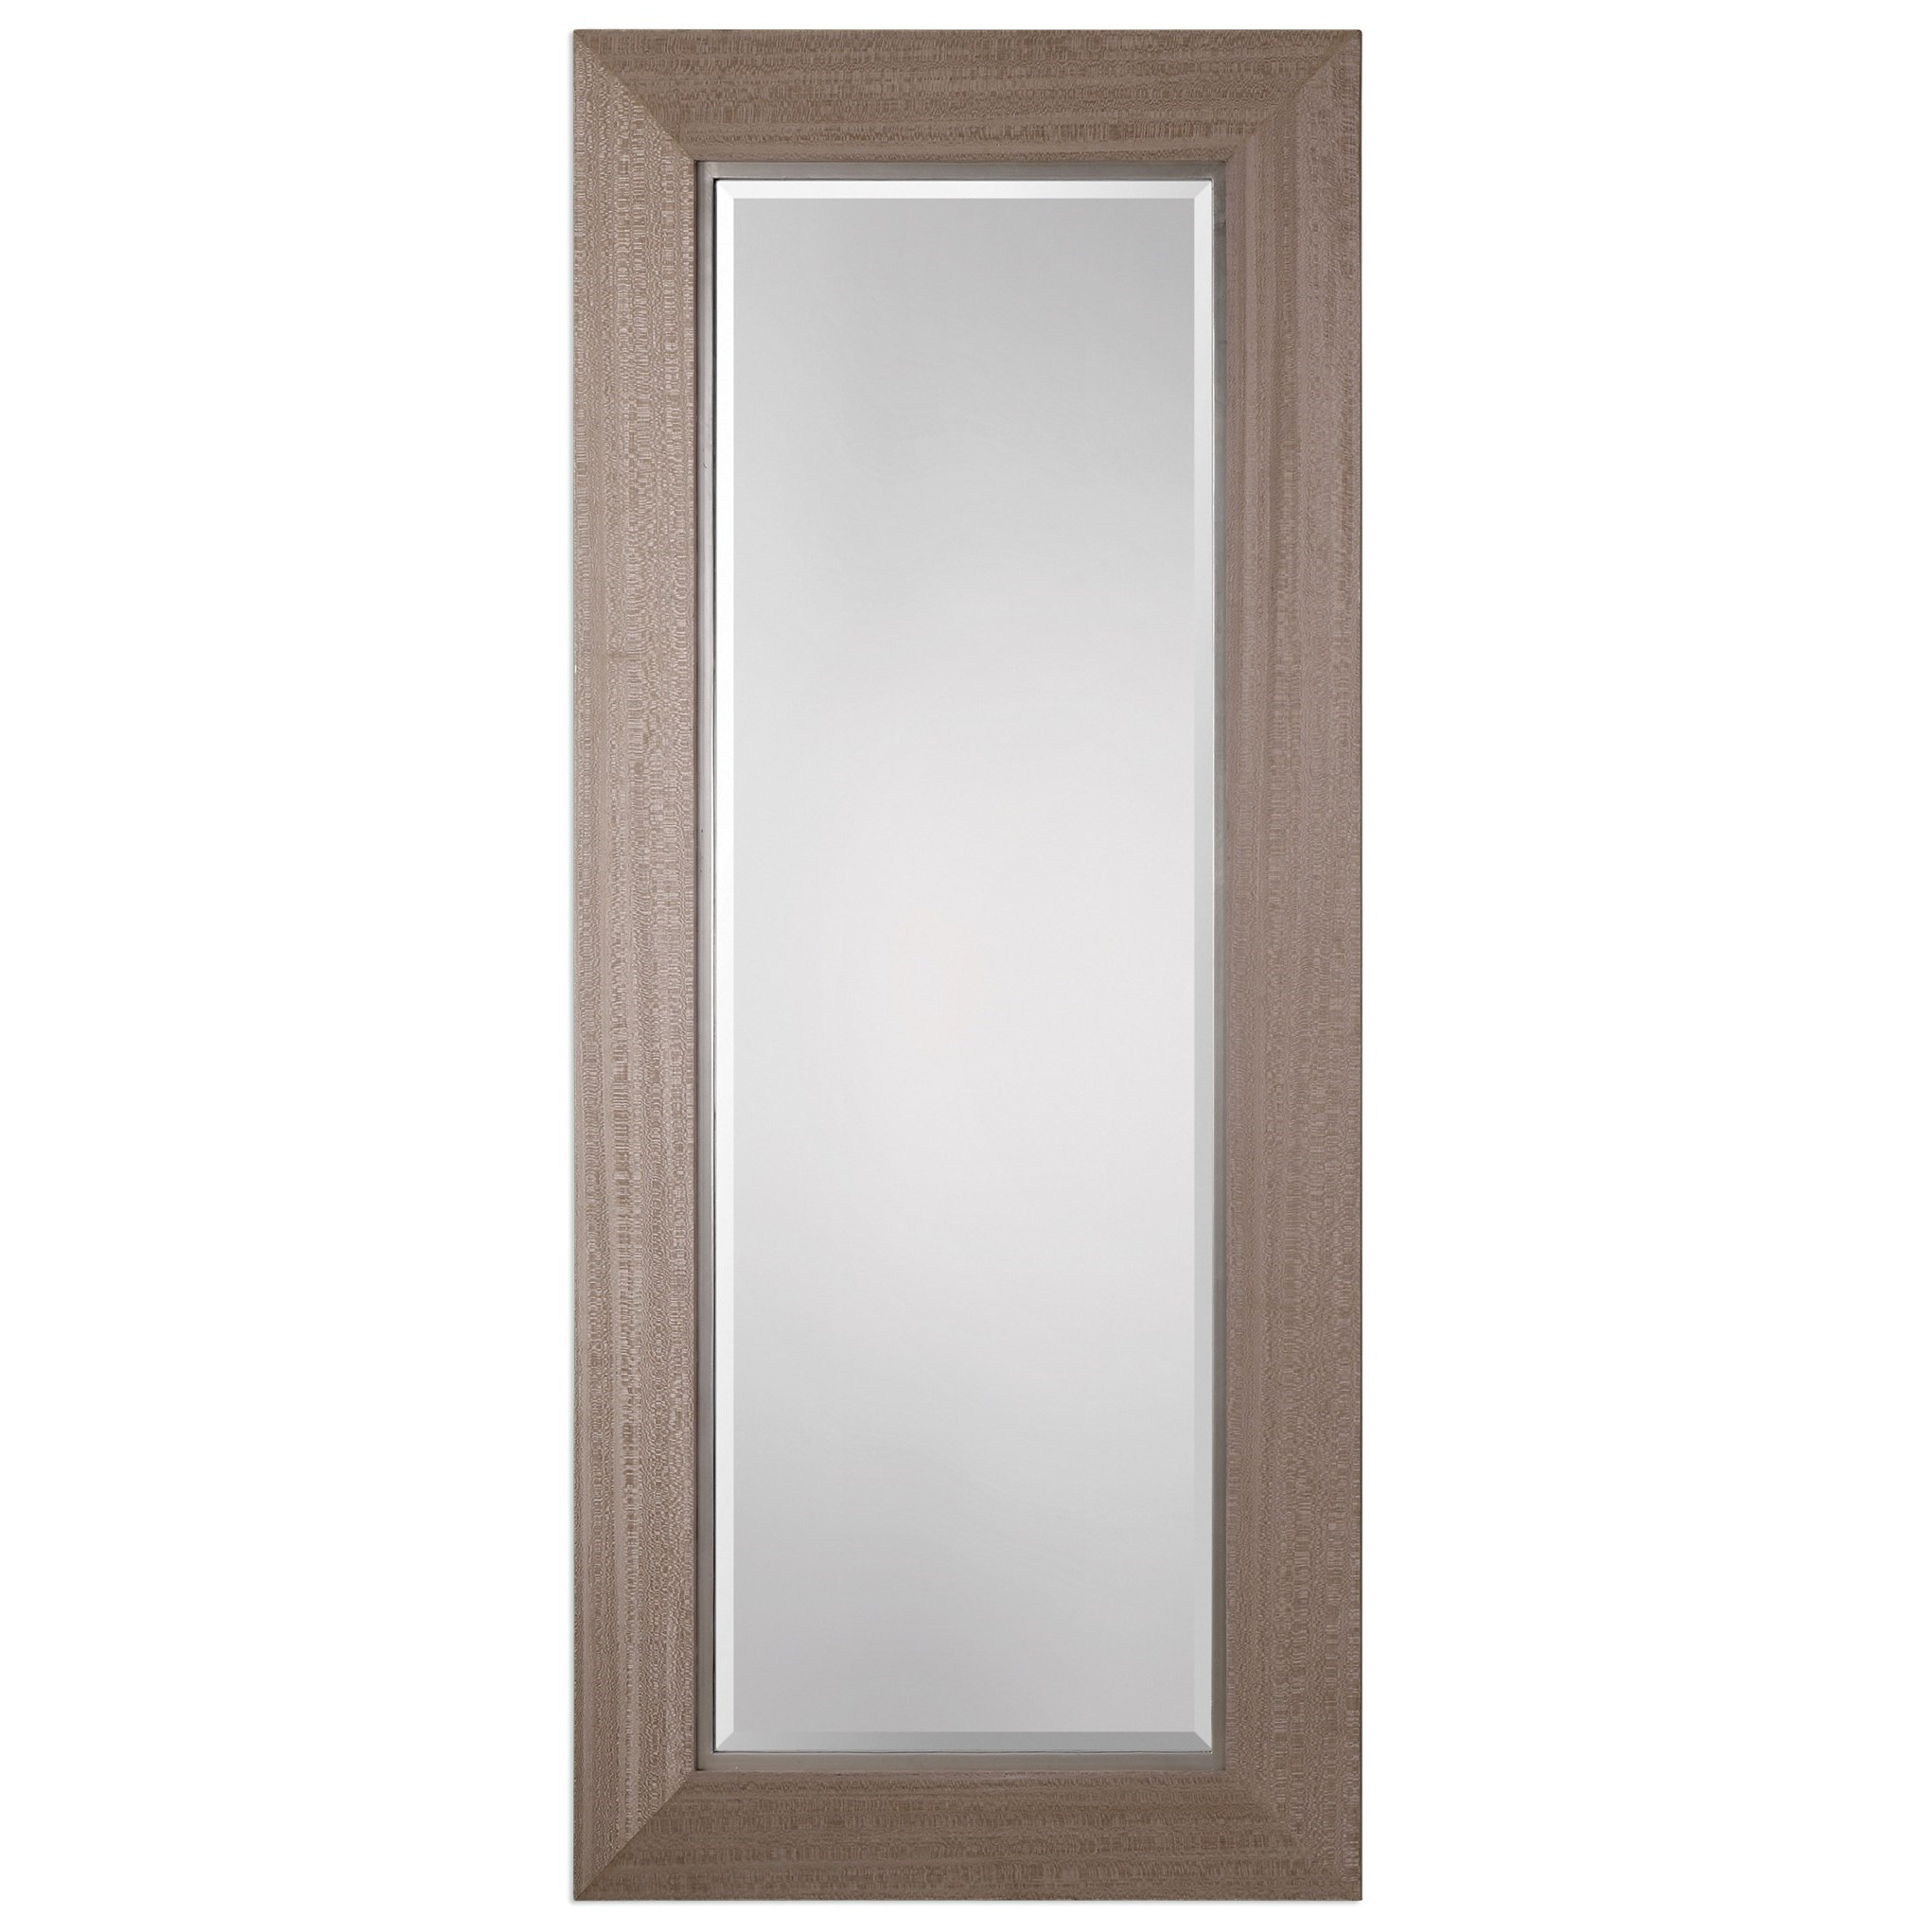 Uttermost Mirrors Pallister - Item Number: 09174